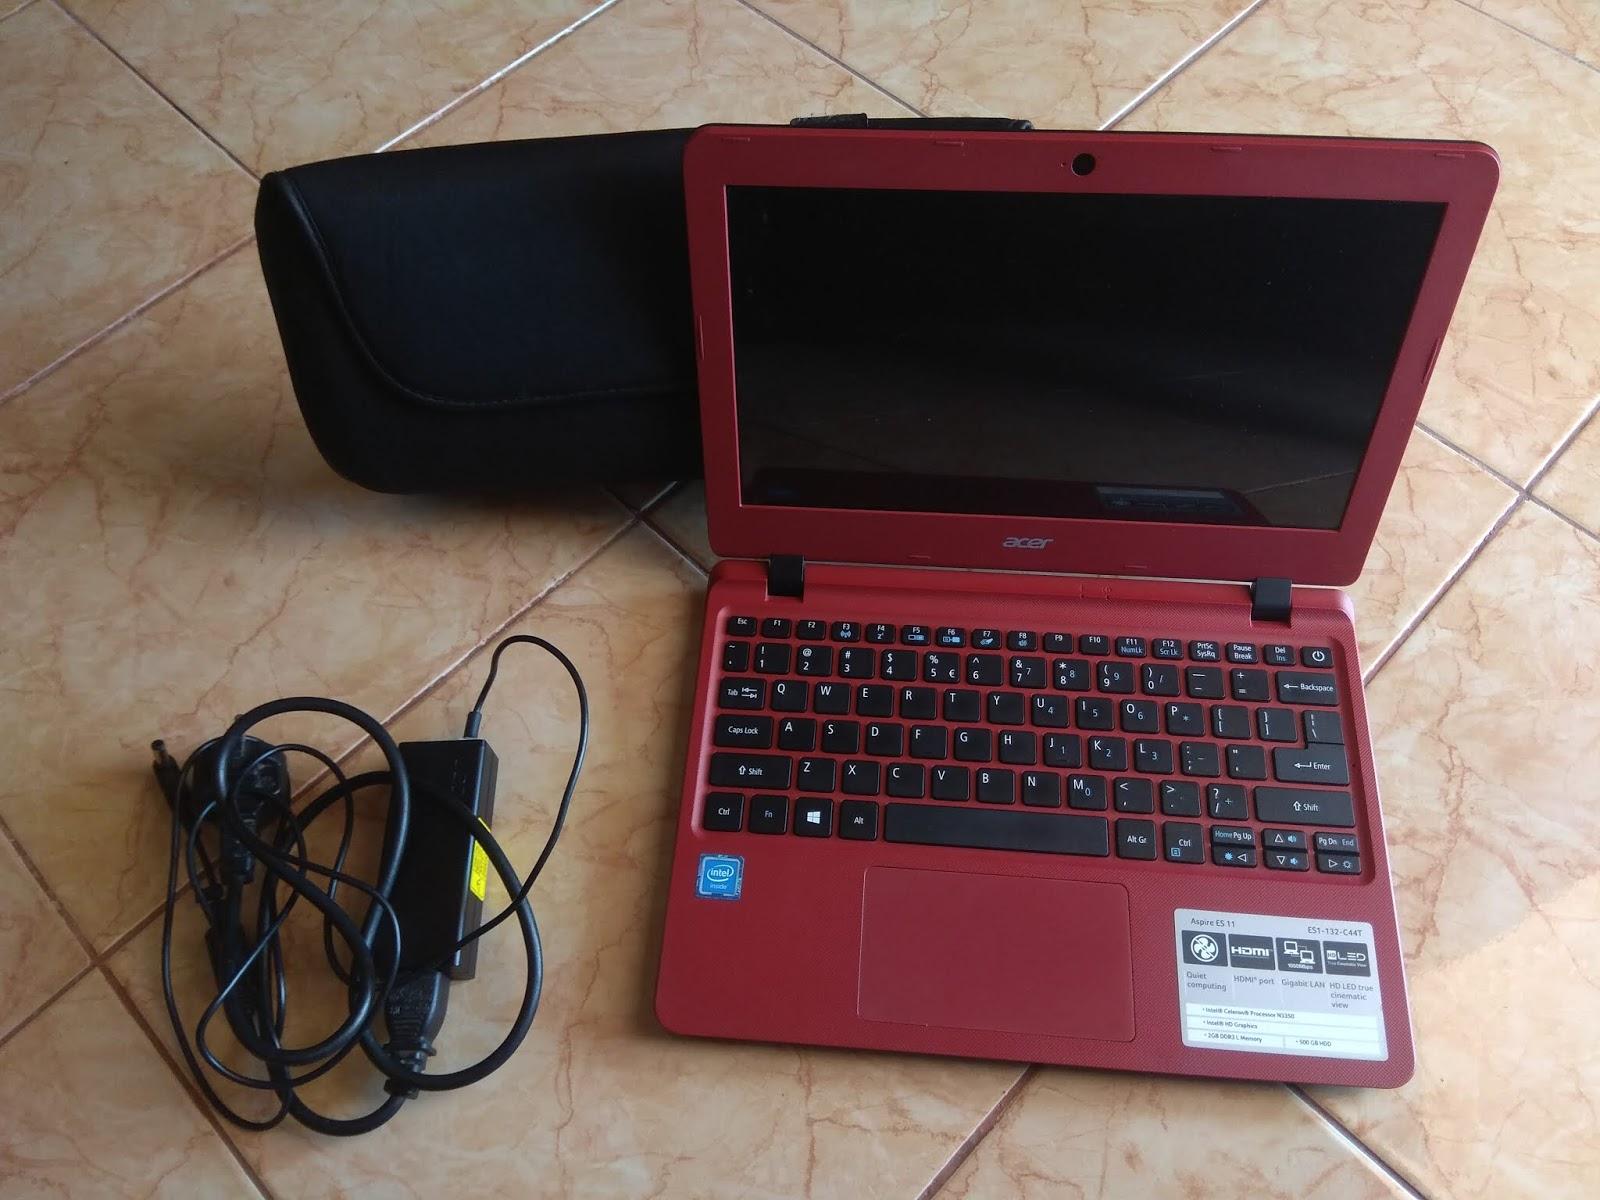 Jual Laptop Laptop Netbook Acer Aspire E3 11 132 Red